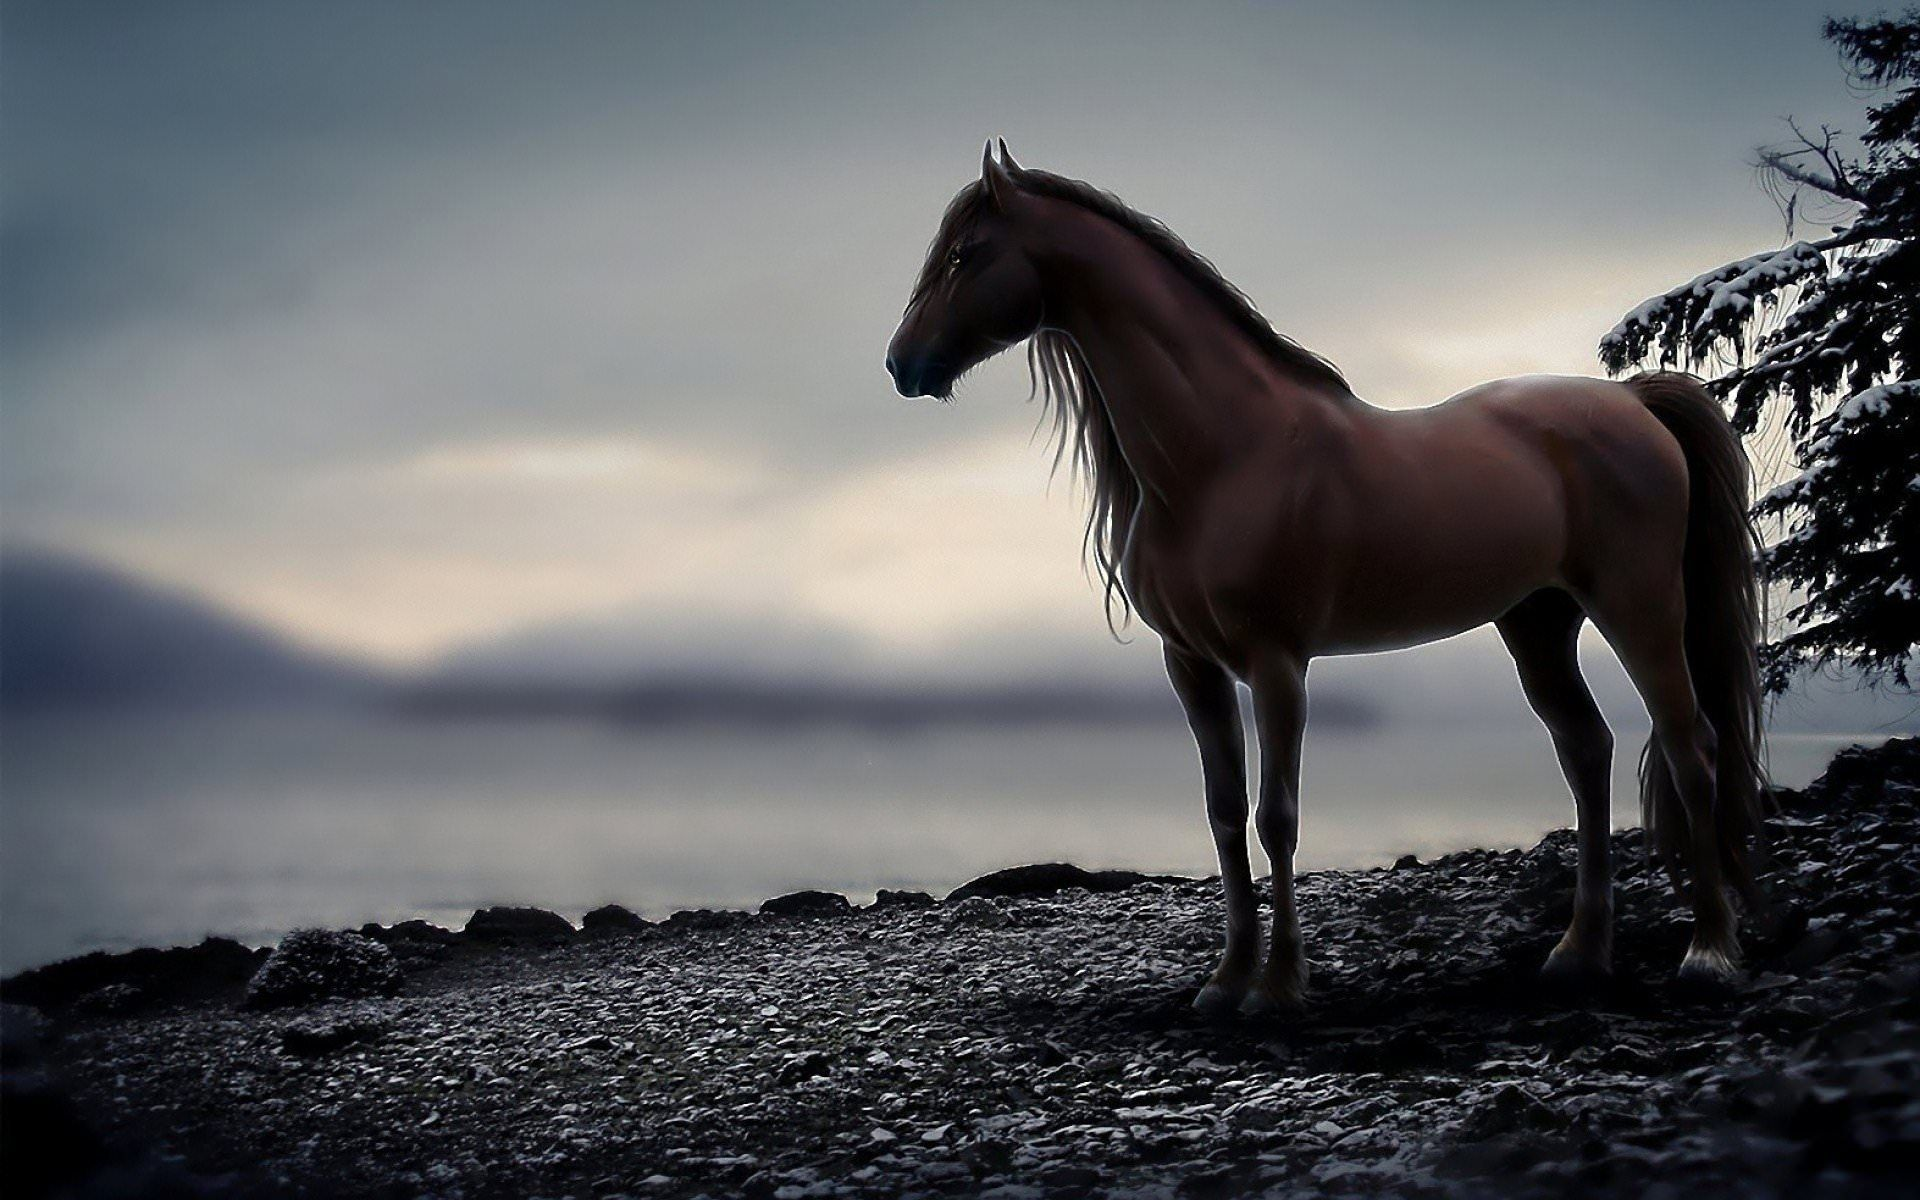 black horse hd wallpapers cool desktop background images ...